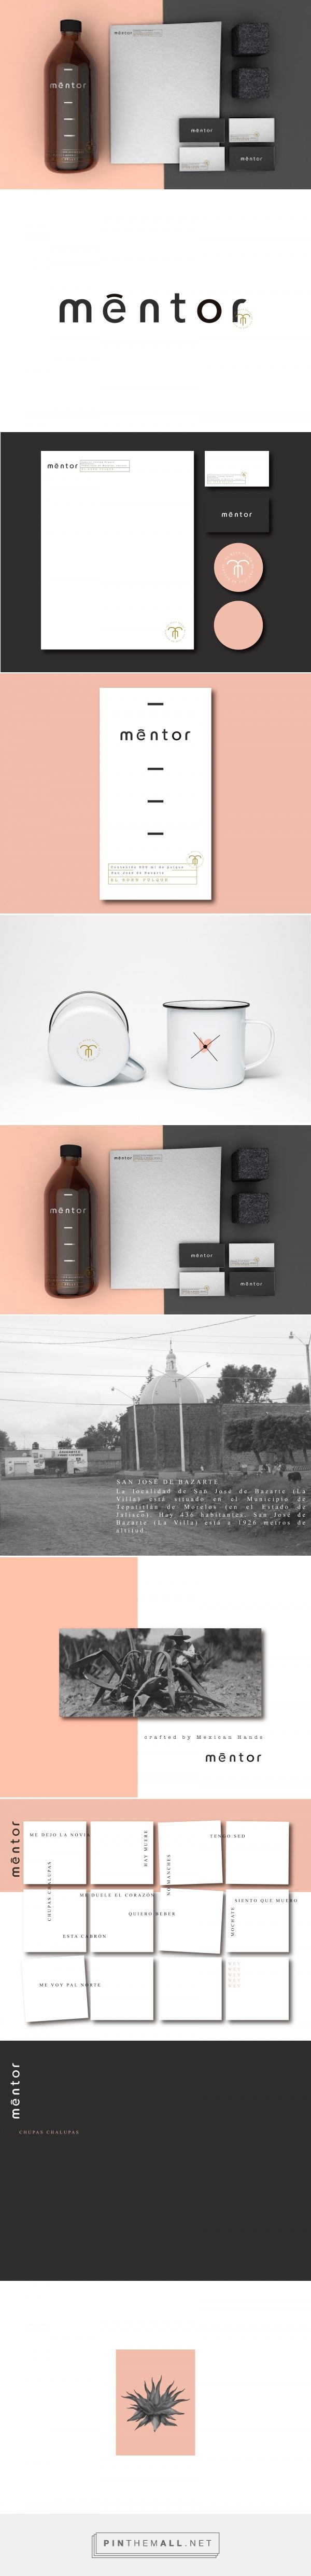 Mentor Branding by Hi Estudio | Fivestar Branding Agency – Design and Branding Agency & Curated Inspiration Gallery